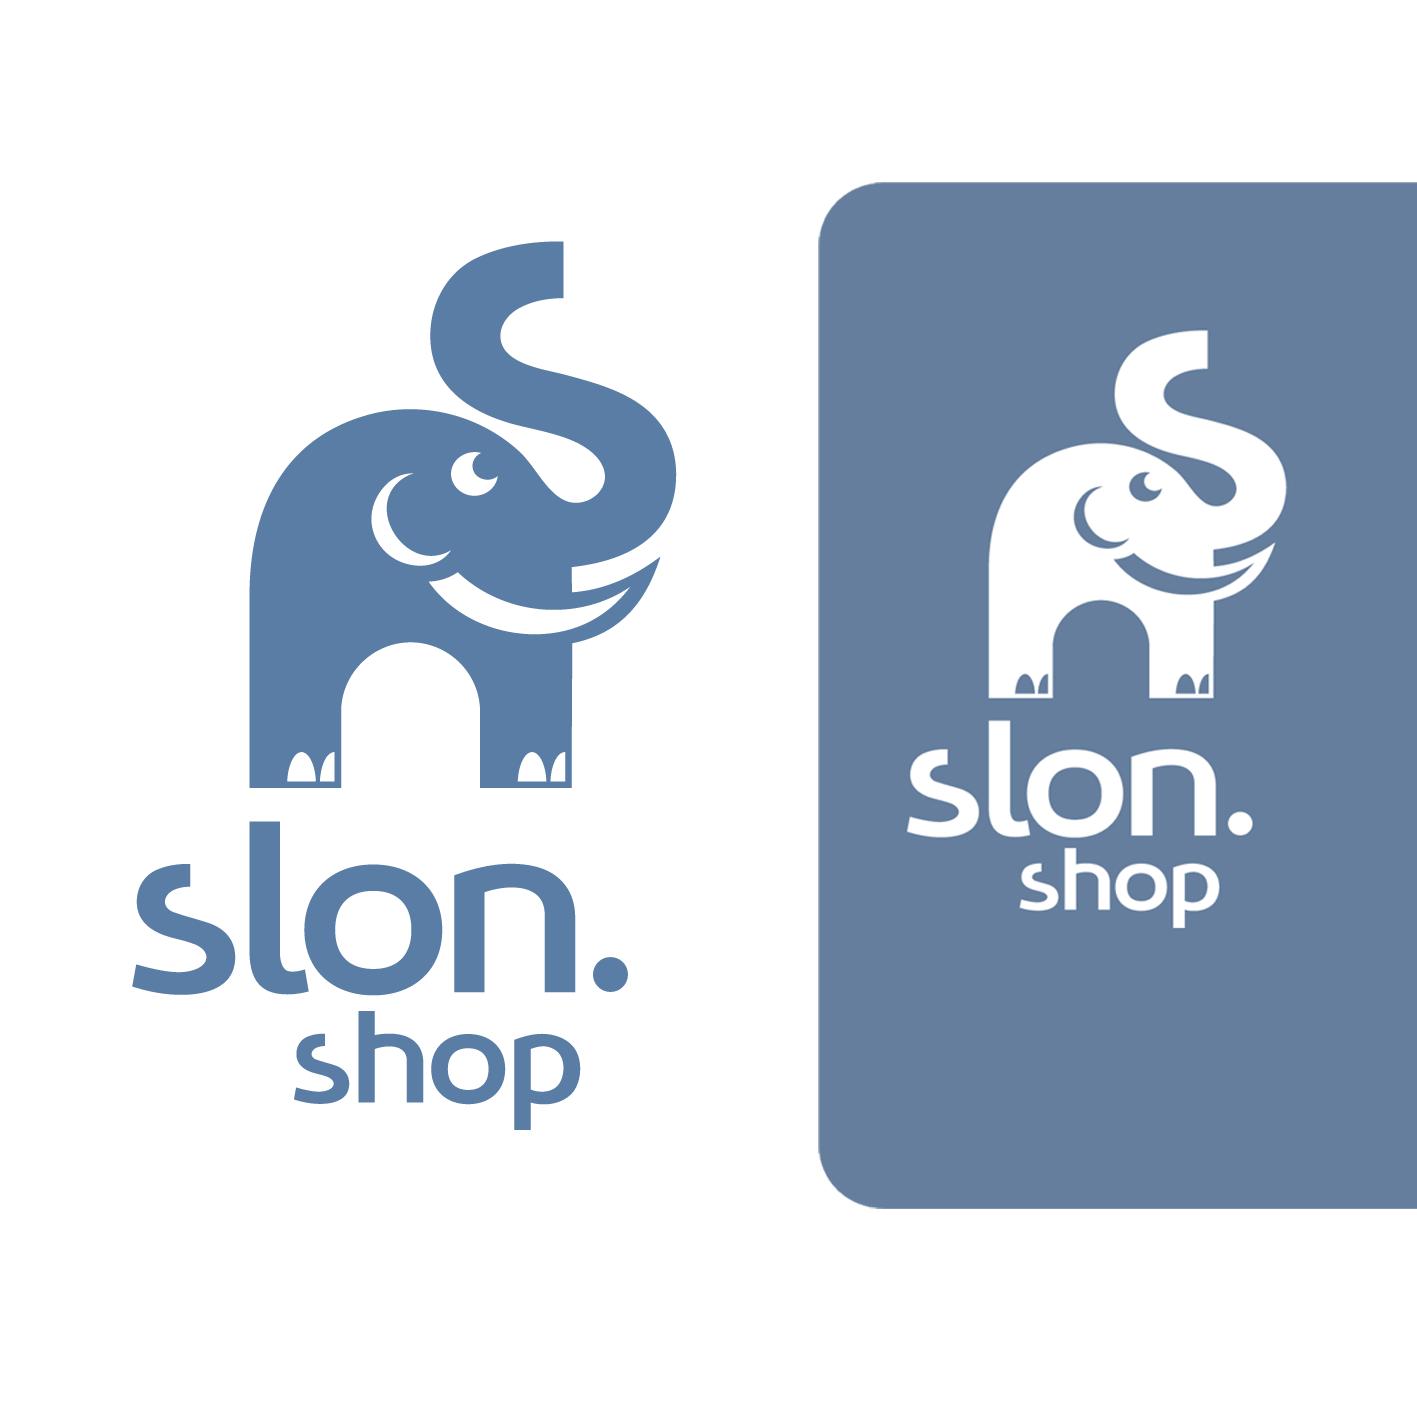 Разработать логотип и фирменный стиль интернет-магазина  фото f_424598a5692d598c.png